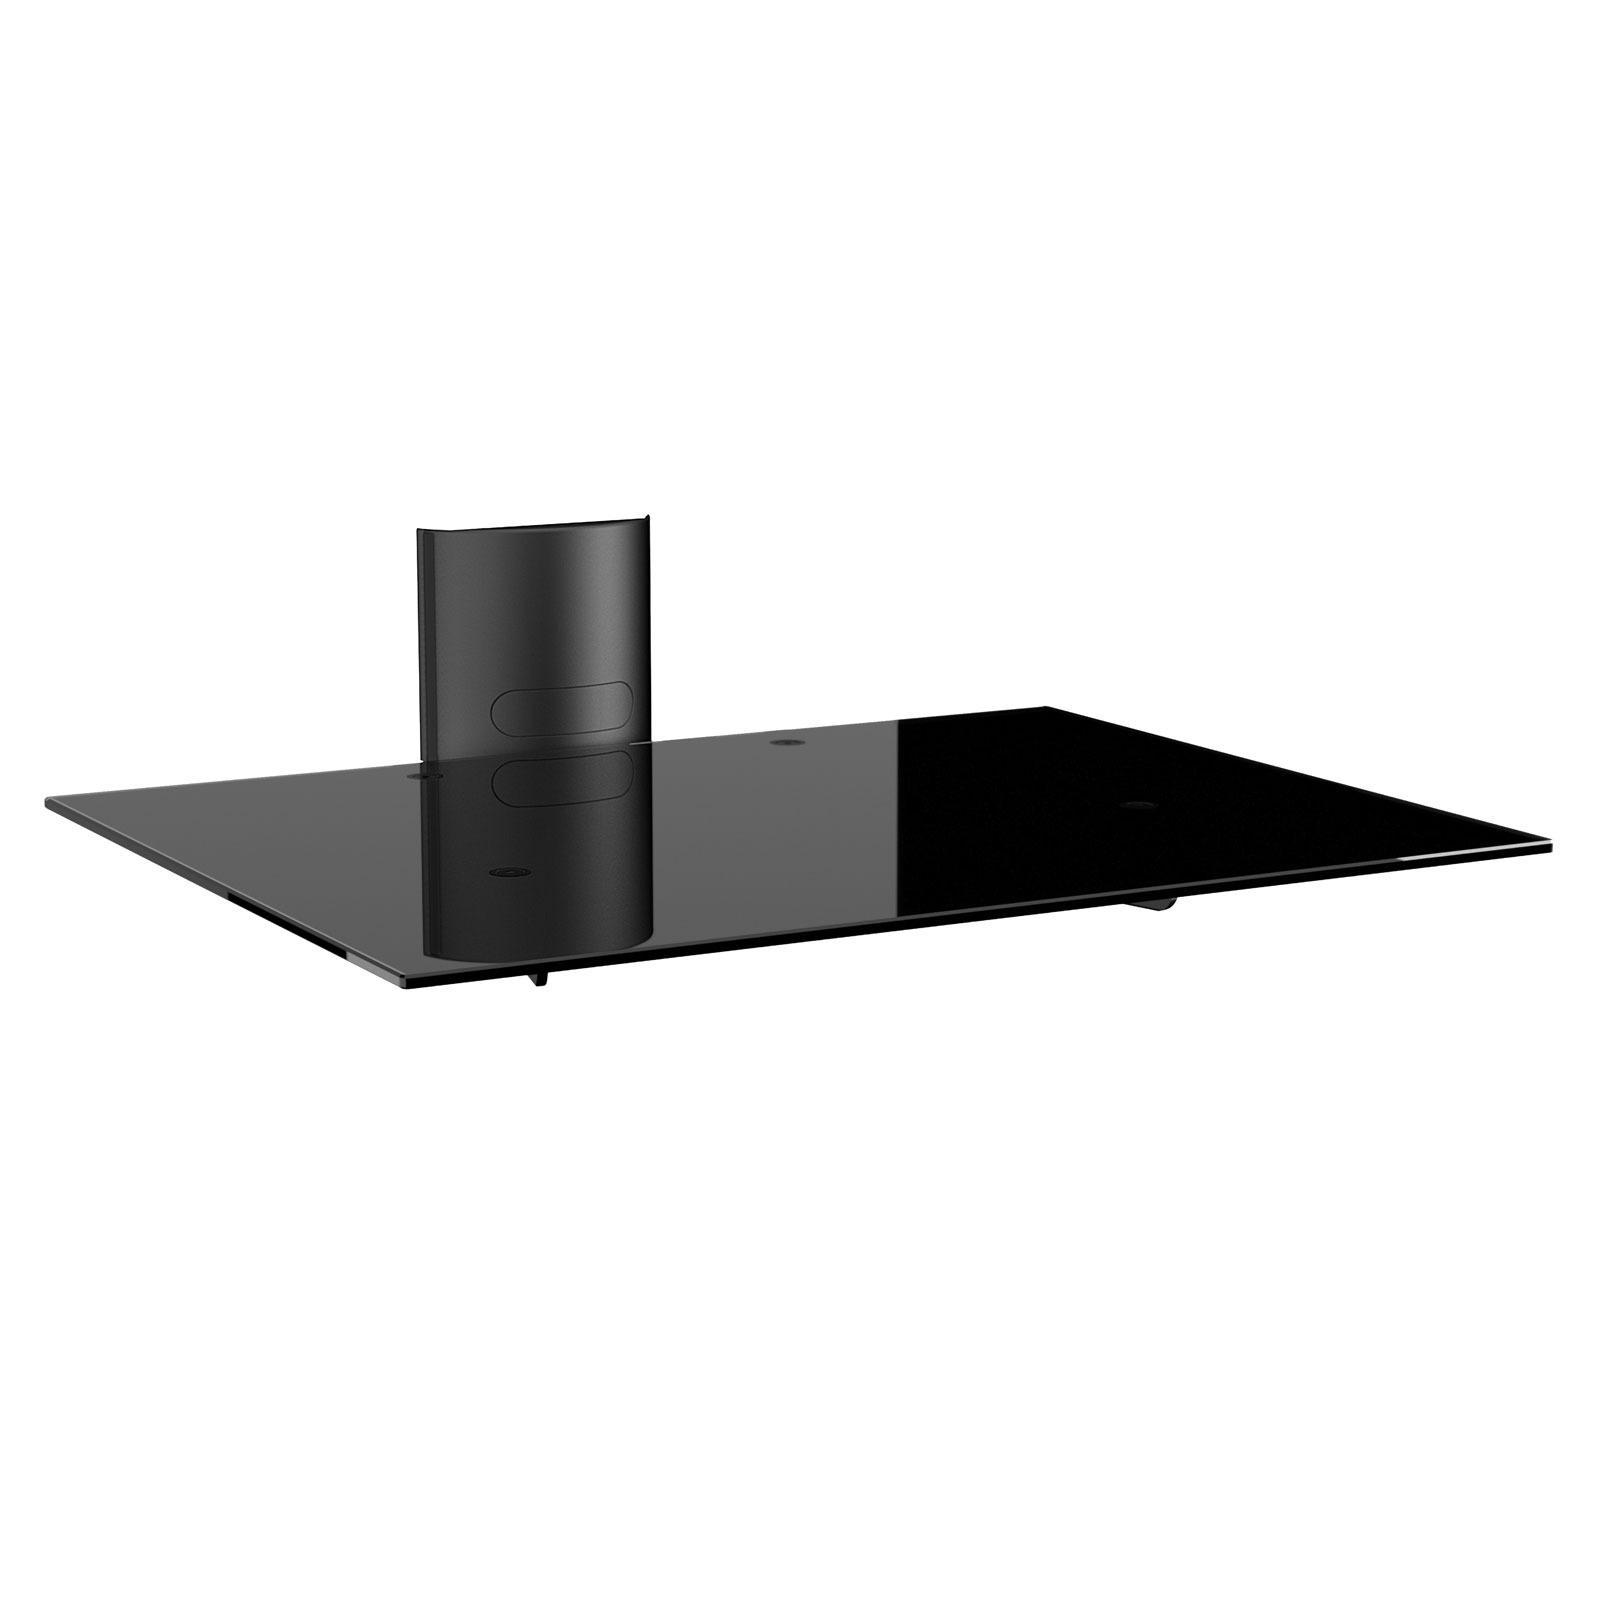 Meliconi av support plus meuble tv meliconi sur for Meuble tv meliconi